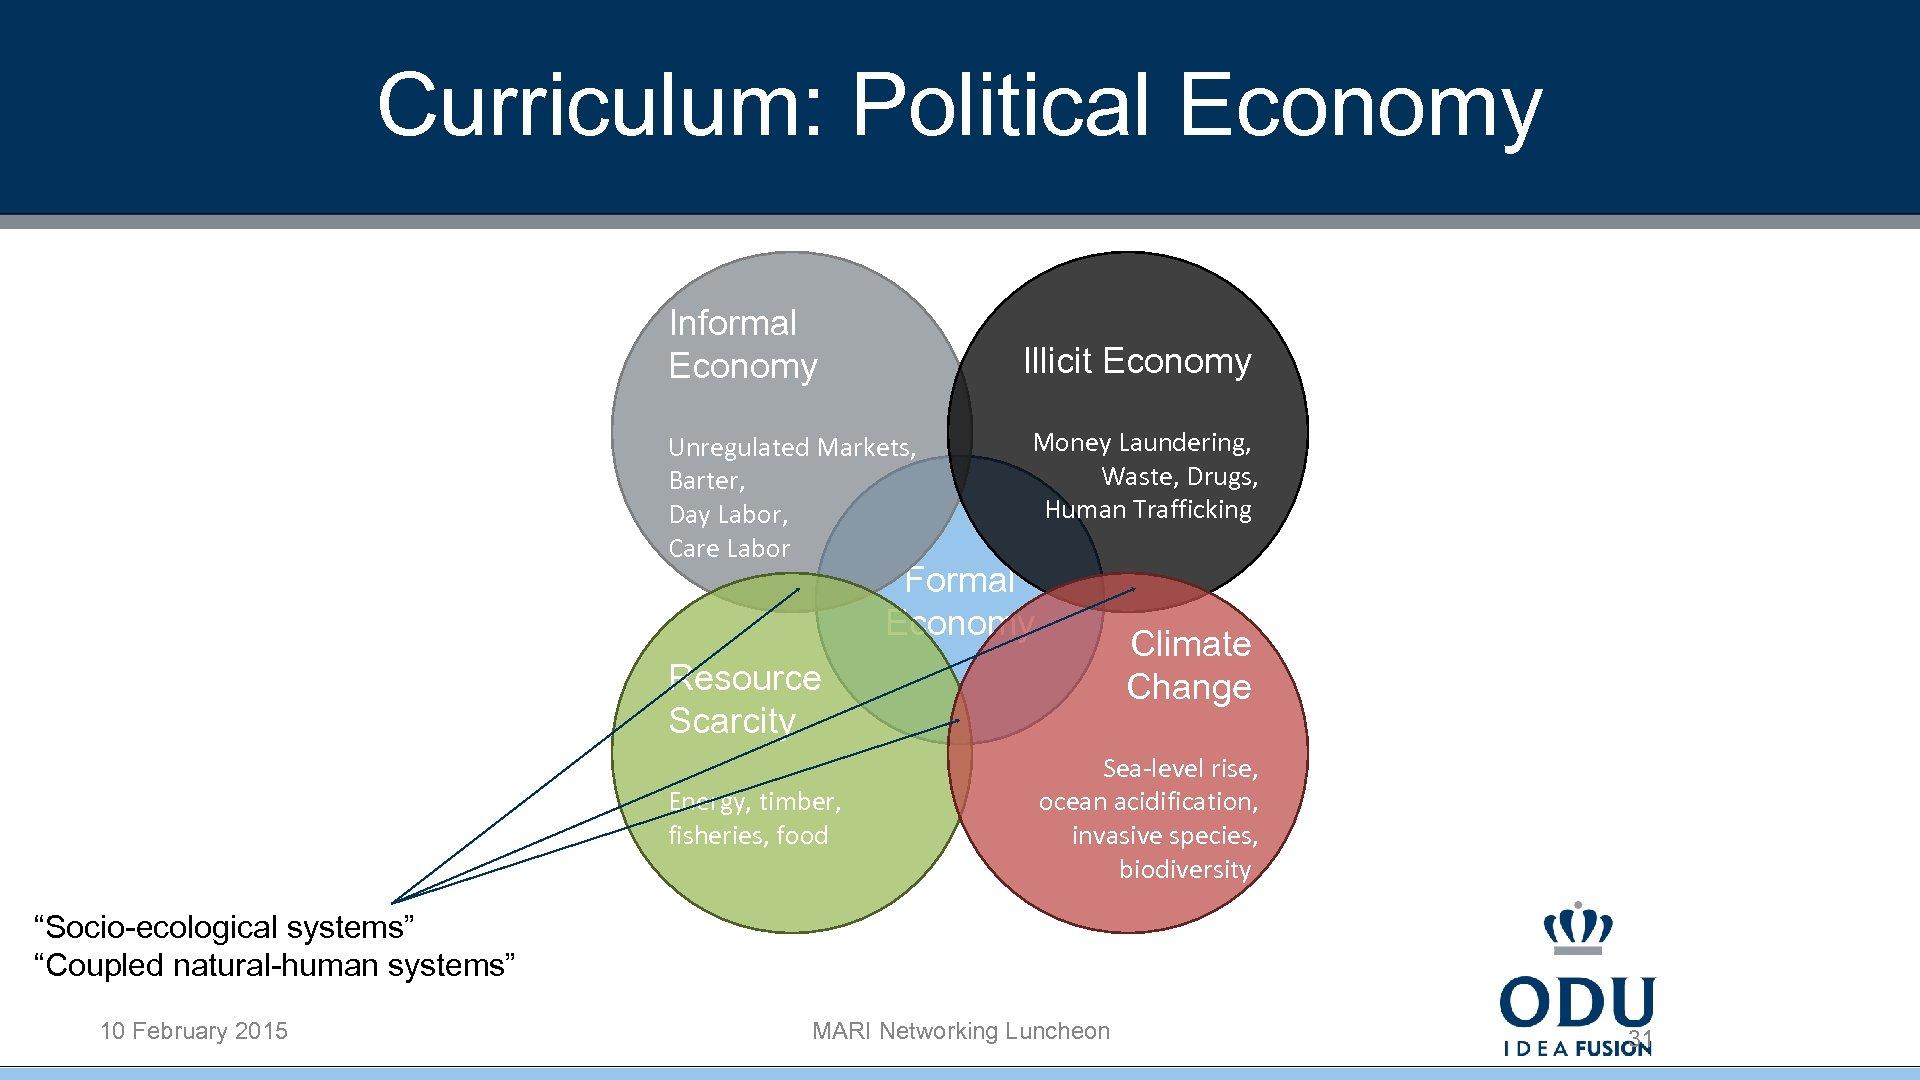 Curriculum: Political Economy Informal Economy Illicit Economy Unregulated Markets, Barter, Day Labor, Care Labor